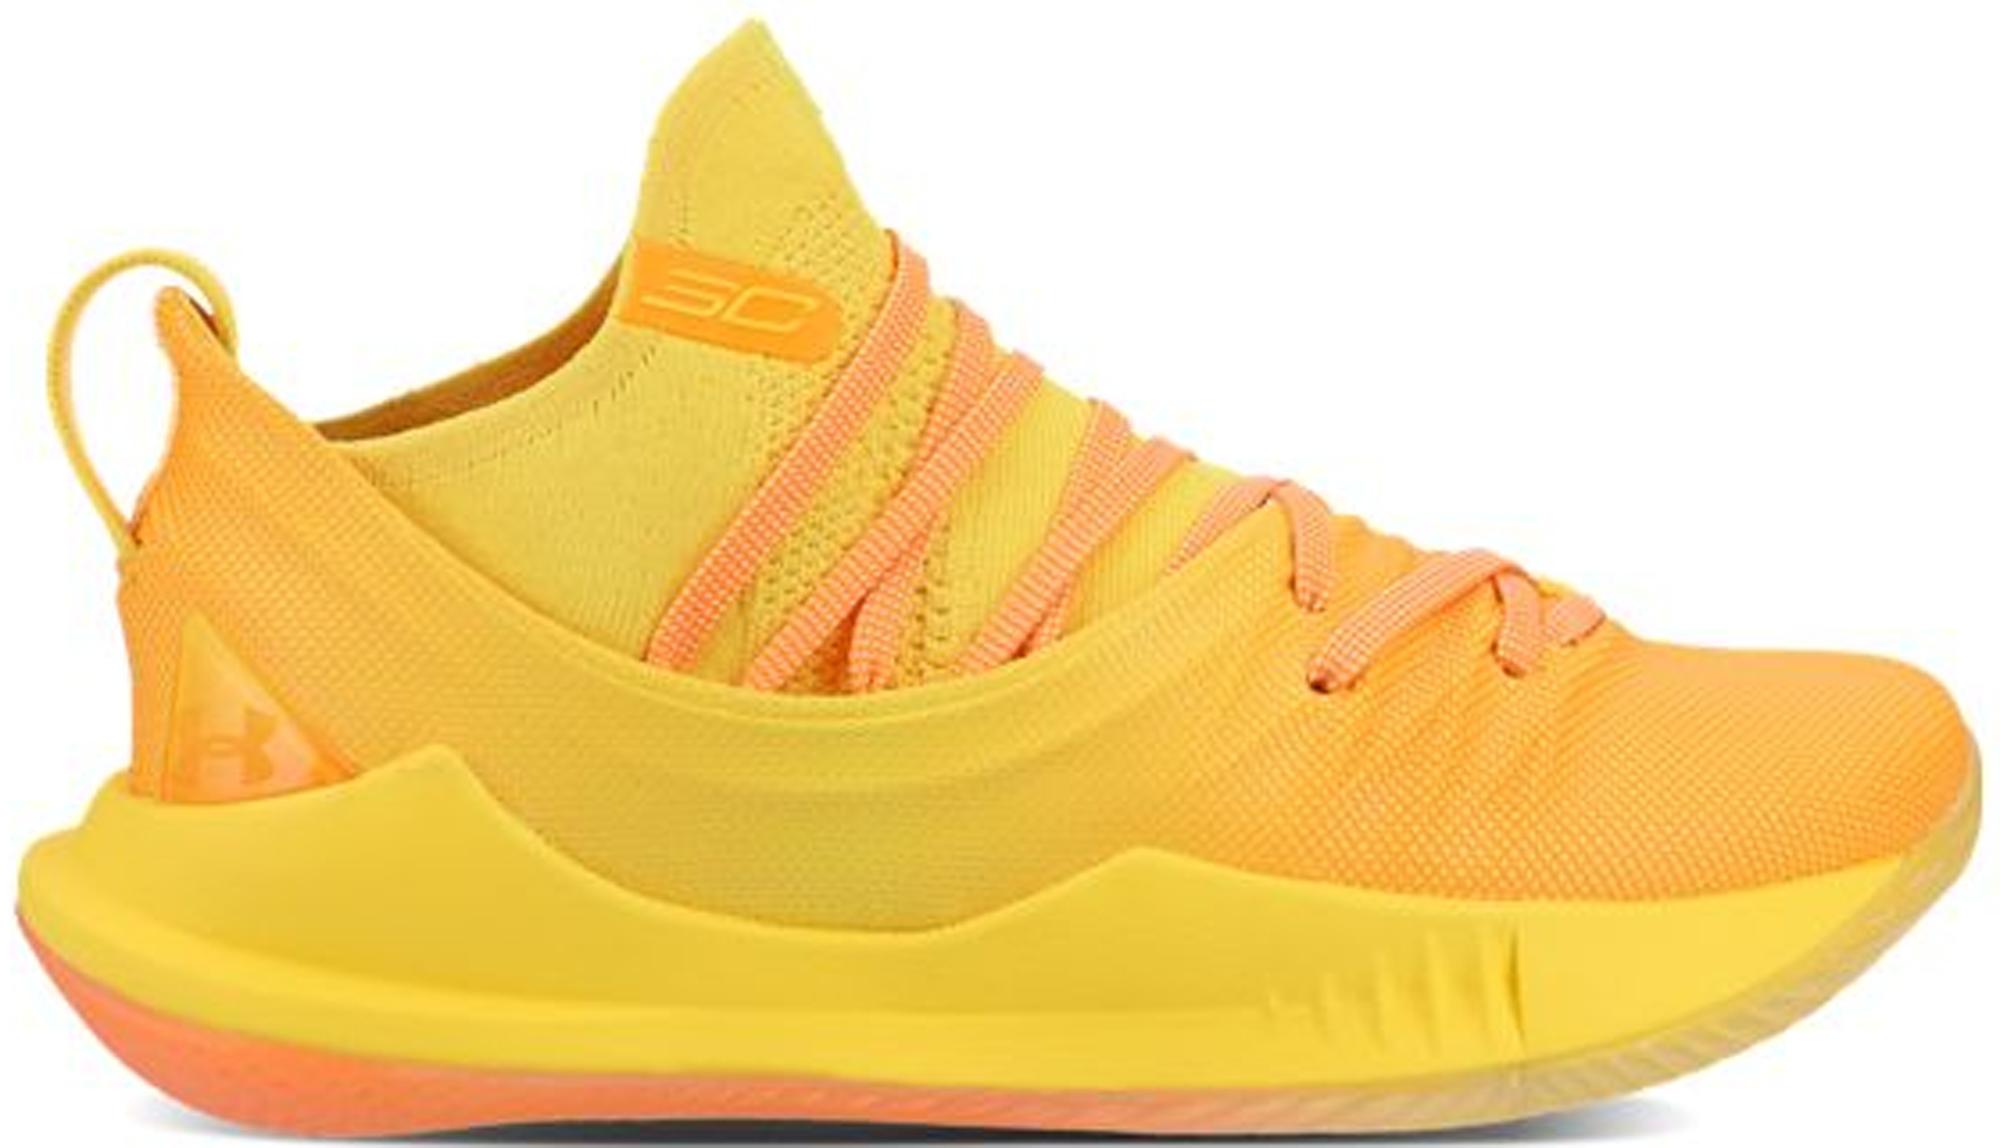 Under Armour Curry 5 Yellow Orange